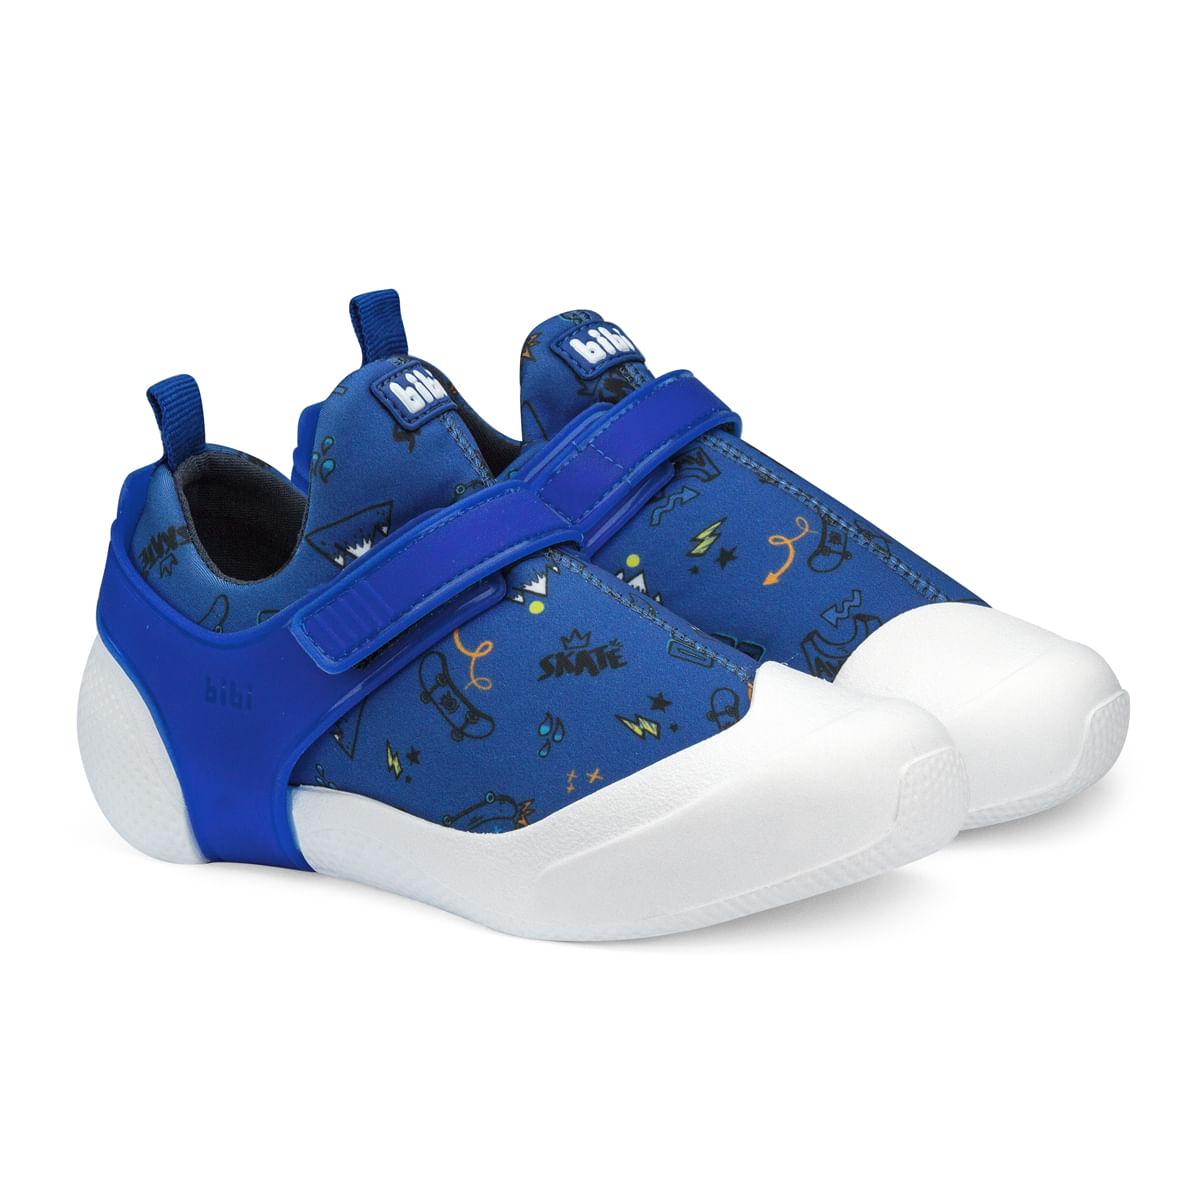 bfe124b0588 Tênis Infantil Bibi Masculino Azul Estampado 2WAY 1093012 - Bibi ...